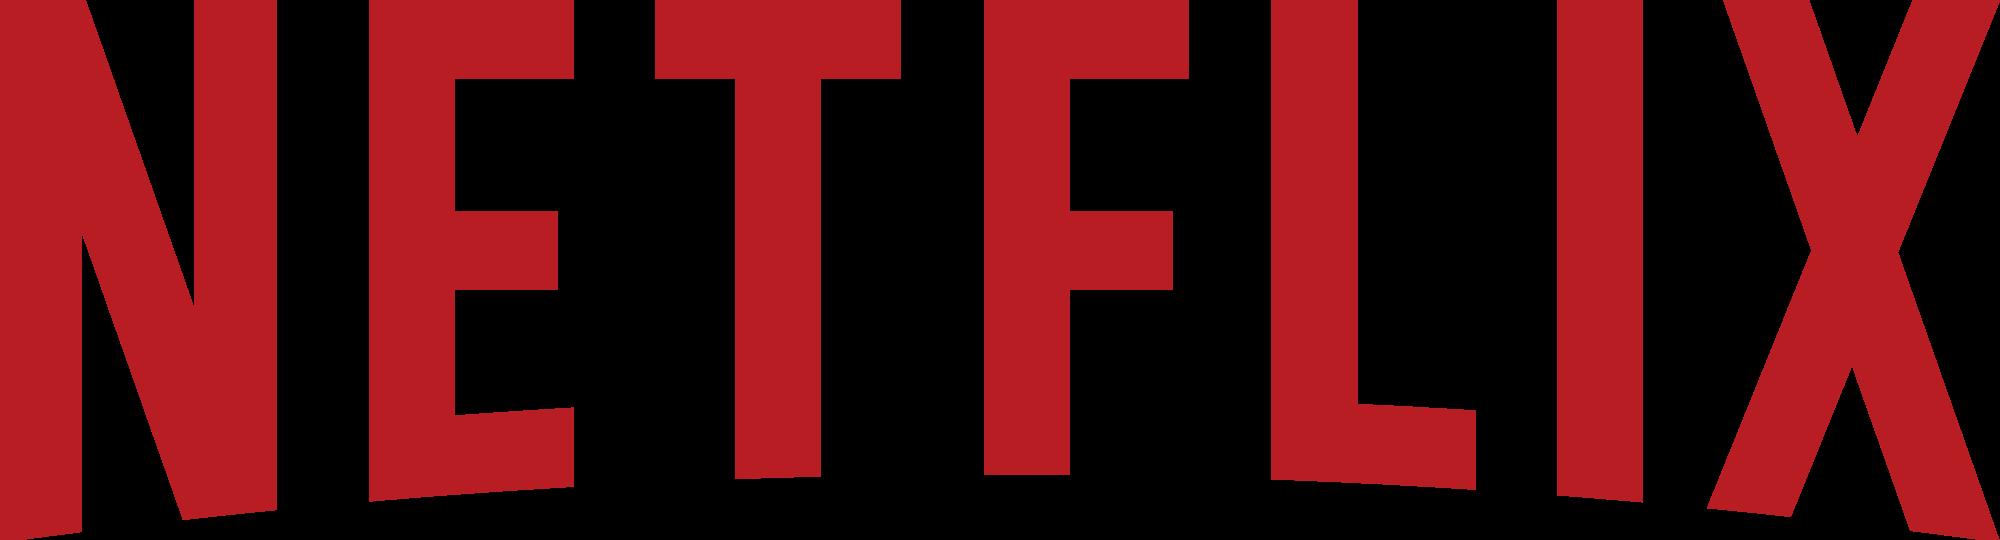 Imagem netflix logog desventuras em srie wiki fandom resoluo original stopboris Images